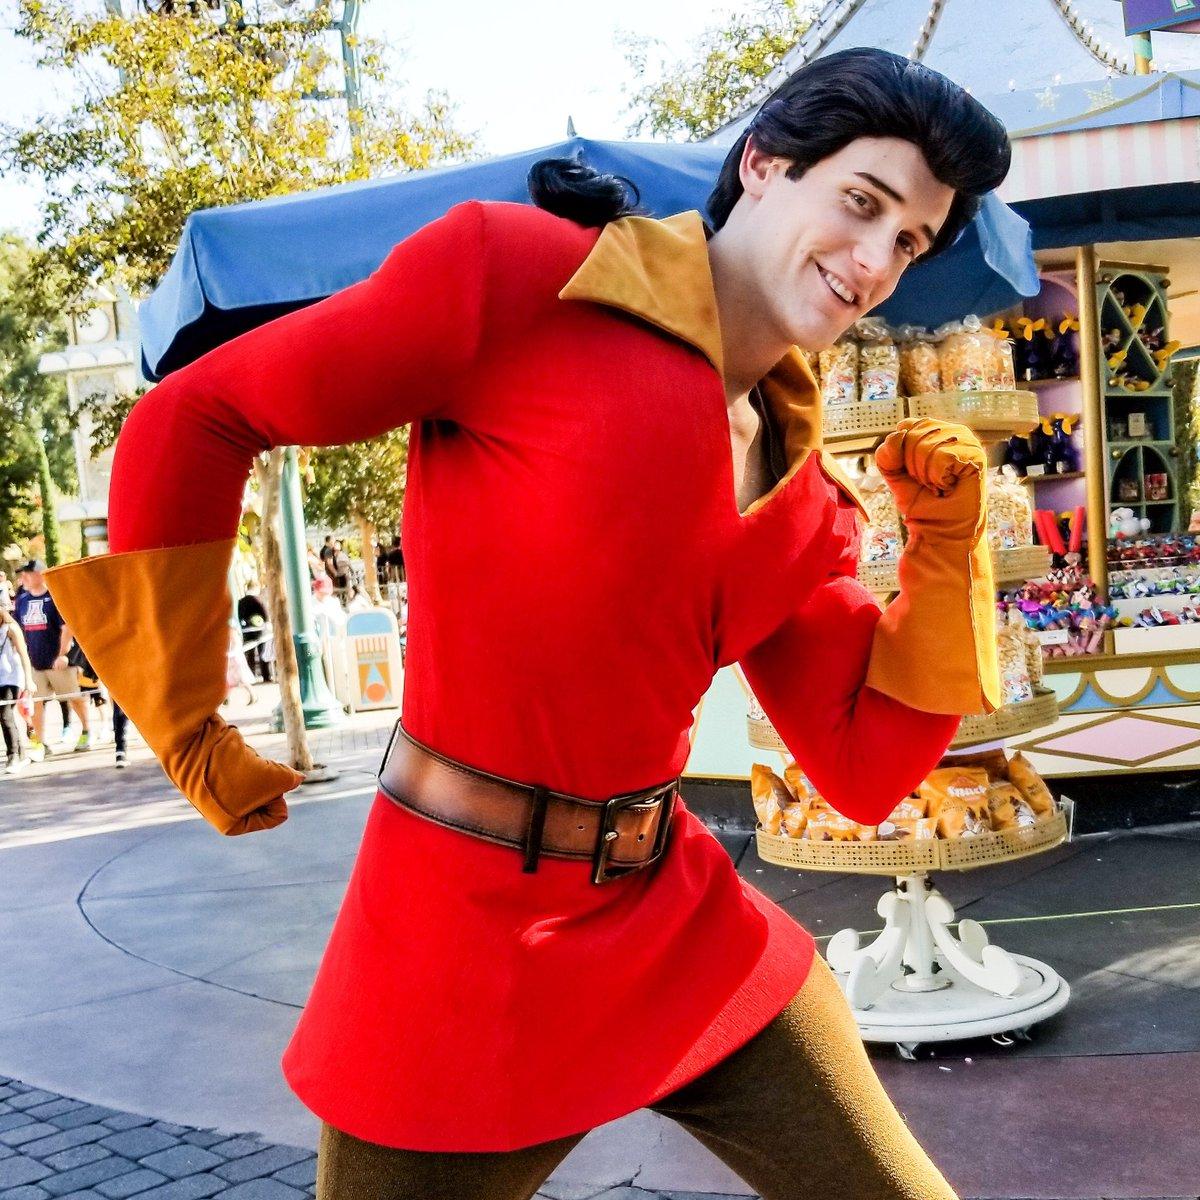 I&#39;m roughly the size of a barge! .. .. #Disney #DisneylandResort #DLR #Disneyland  #DisneyCharacters #BeautyAndTheBeast #Gaston <br>http://pic.twitter.com/O4MaTG3ng1 &ndash; à Disneyland